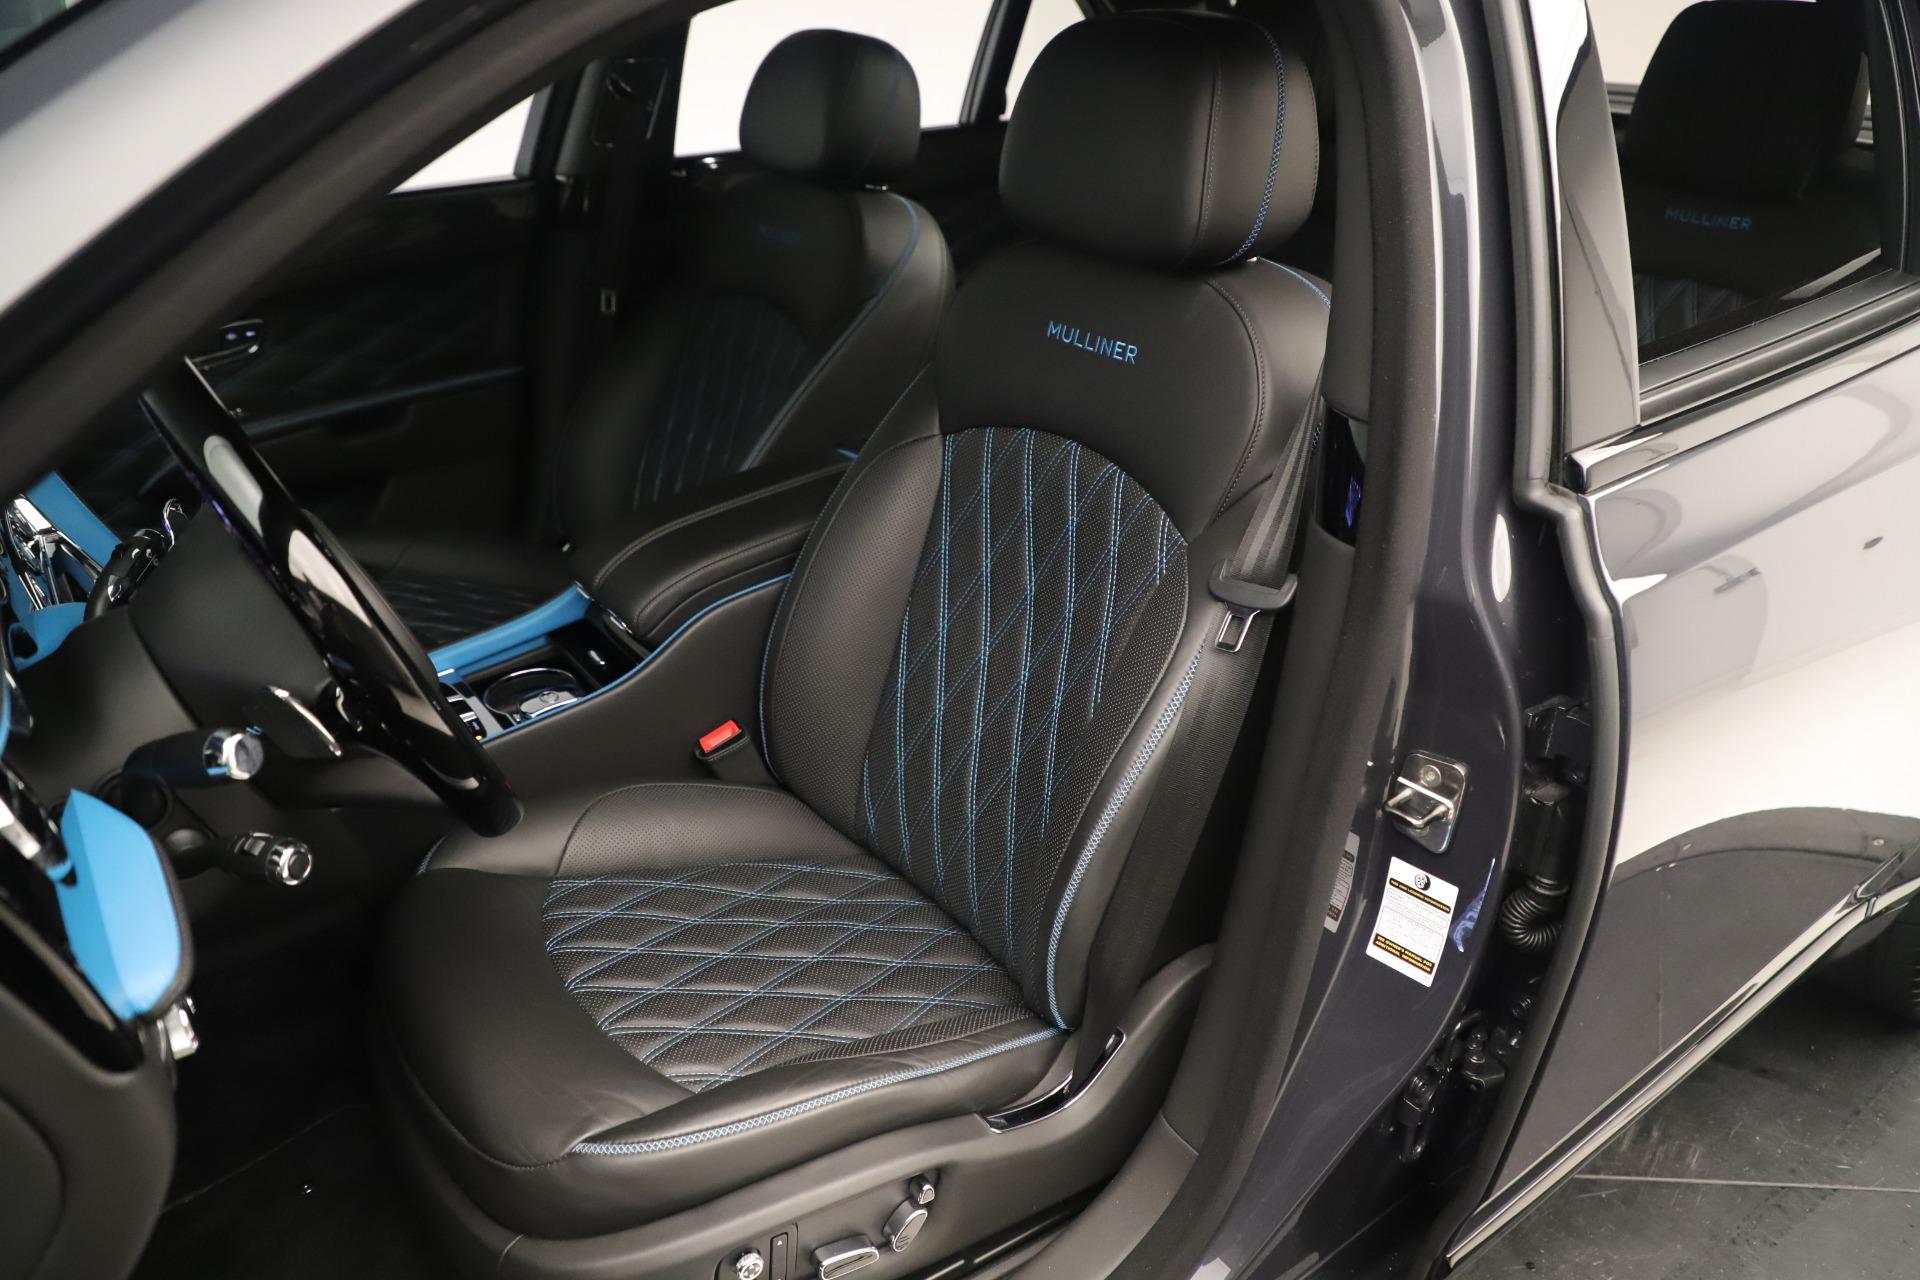 Used 2018 Bentley Mulsanne Speed Design Series For Sale In Westport, CT 3405_p20